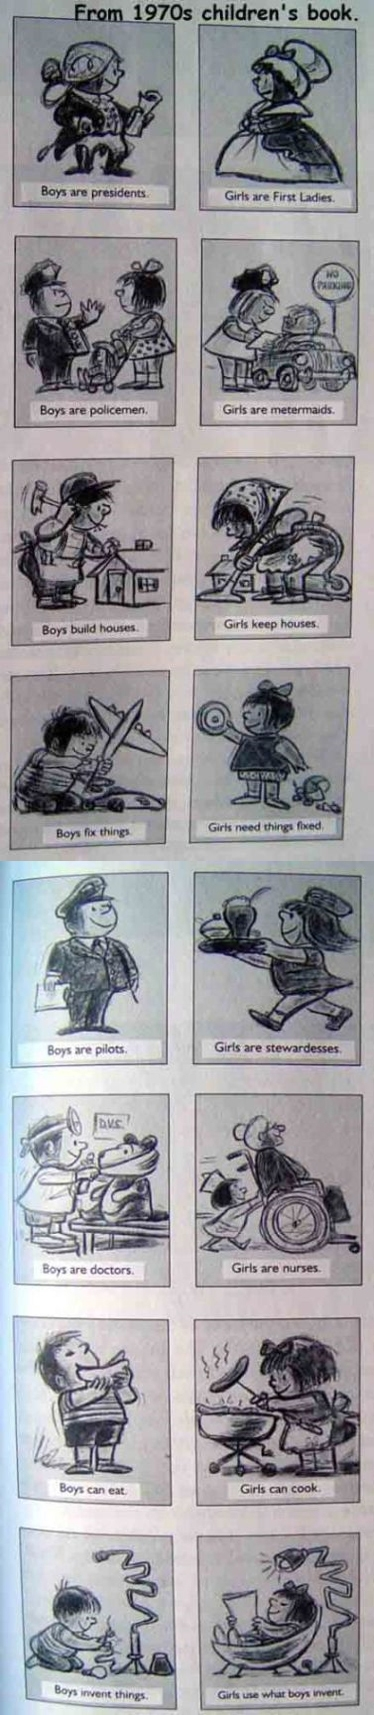 1970sbook